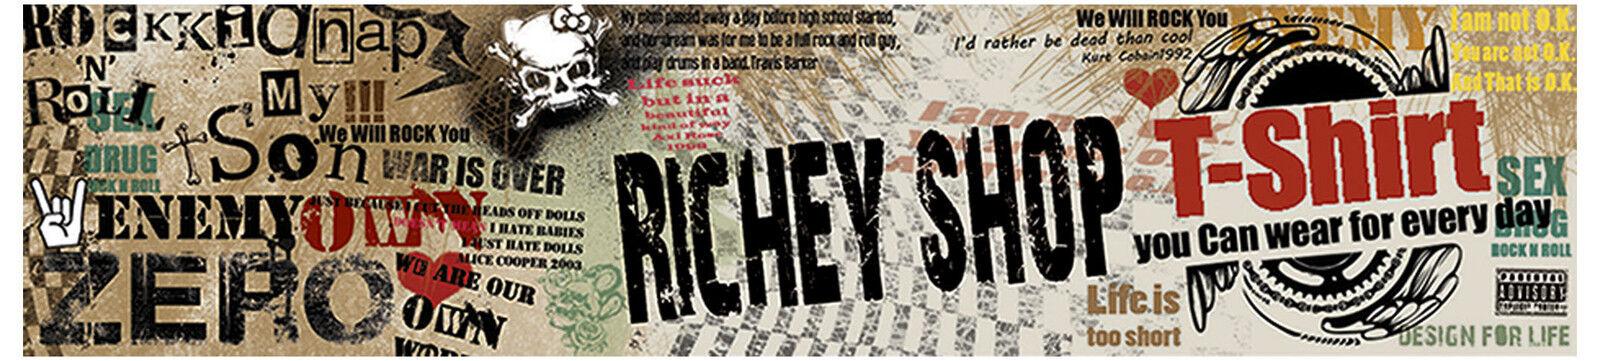 richey8_1978